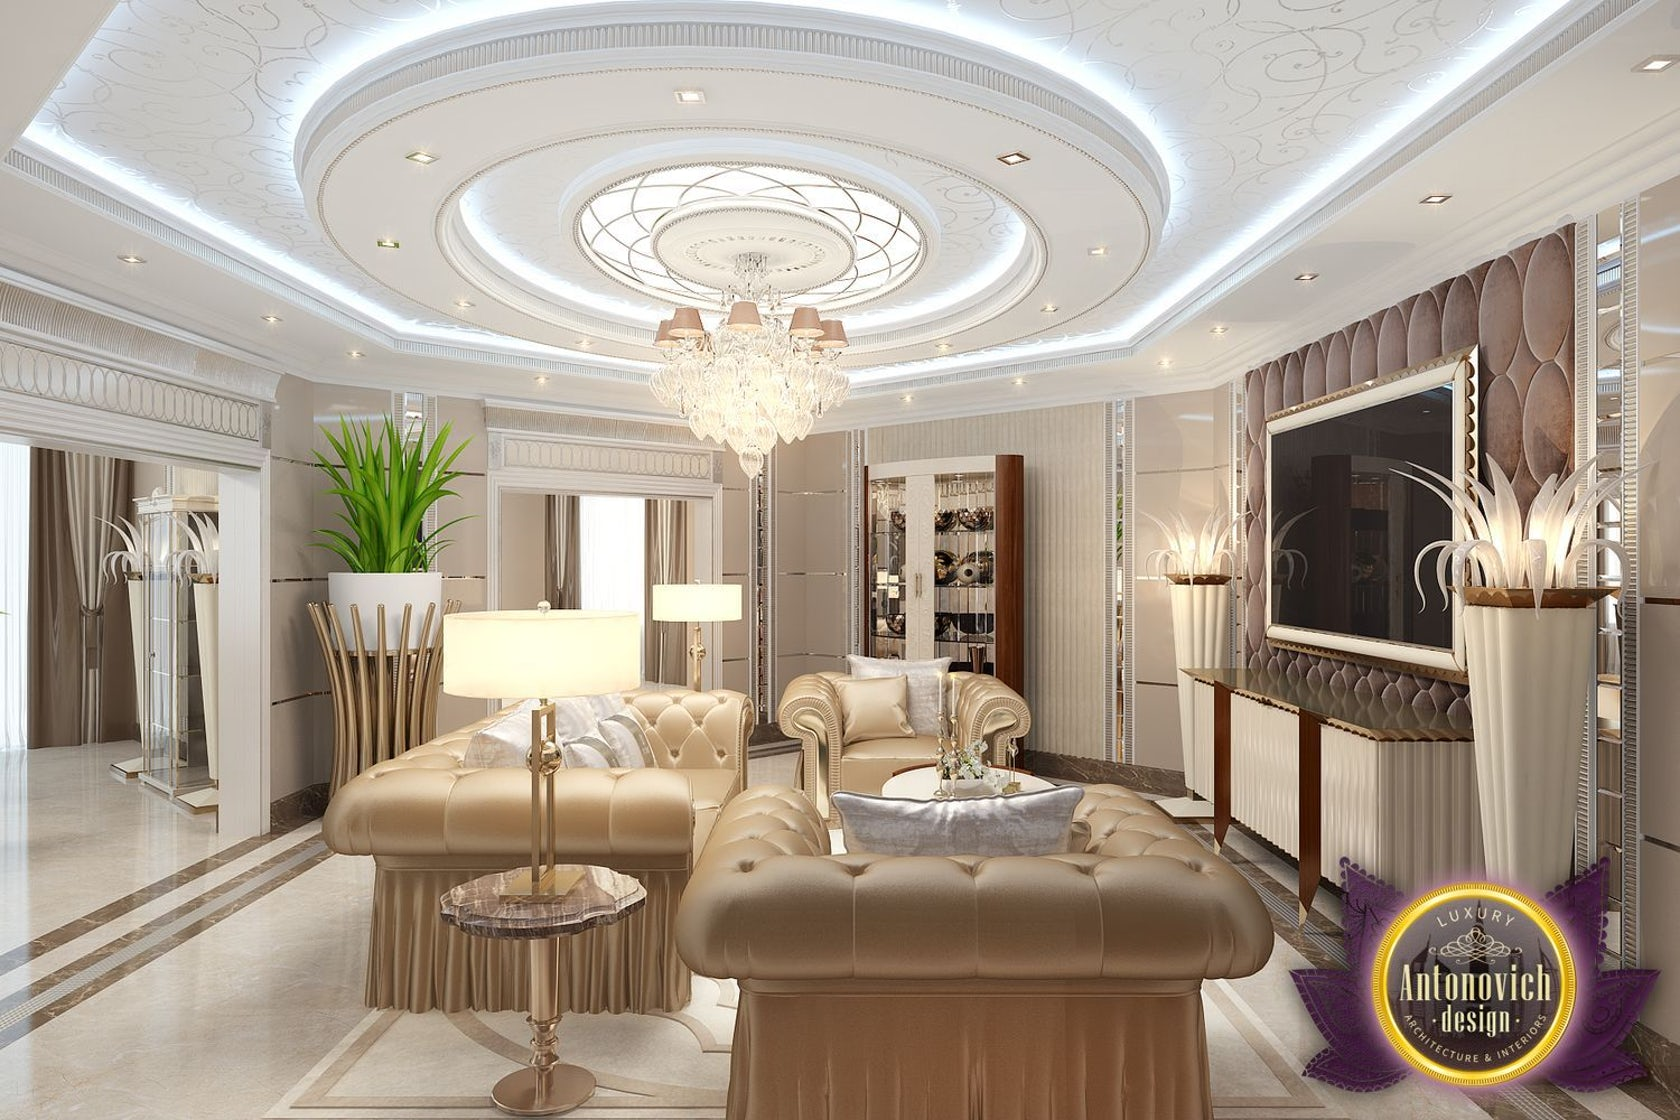 Living room decoration ideas by luxury antonovich design architizer - Room interior decoration ...